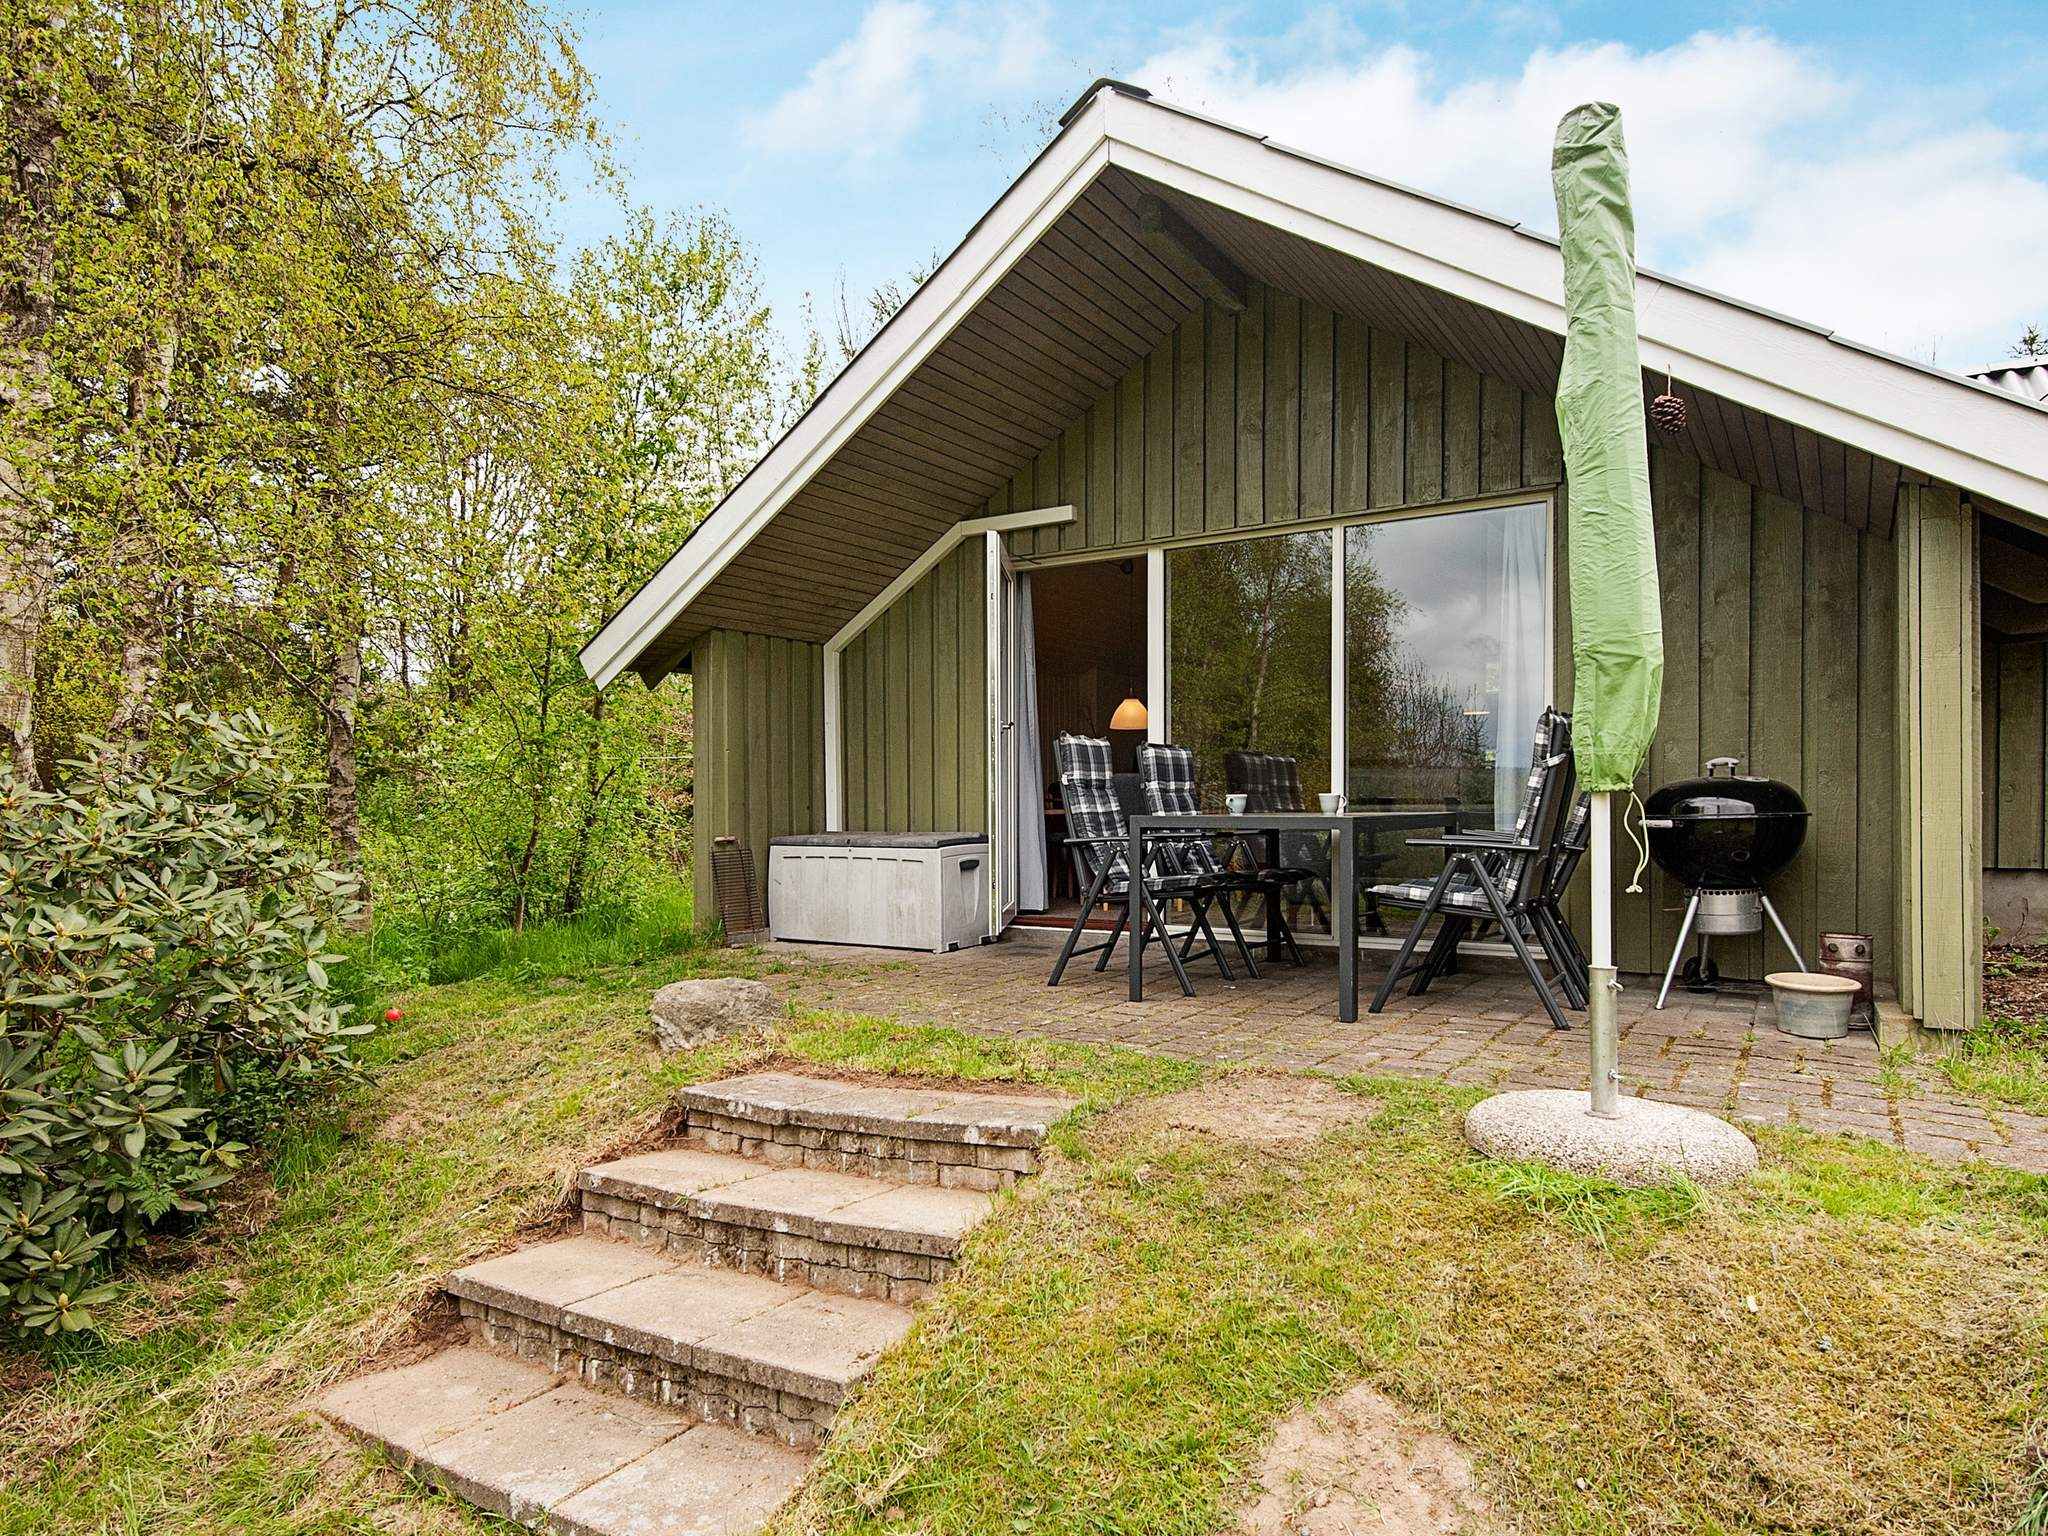 Ferienhaus Ry (83836), Ry, , Ostjütland, Dänemark, Bild 27